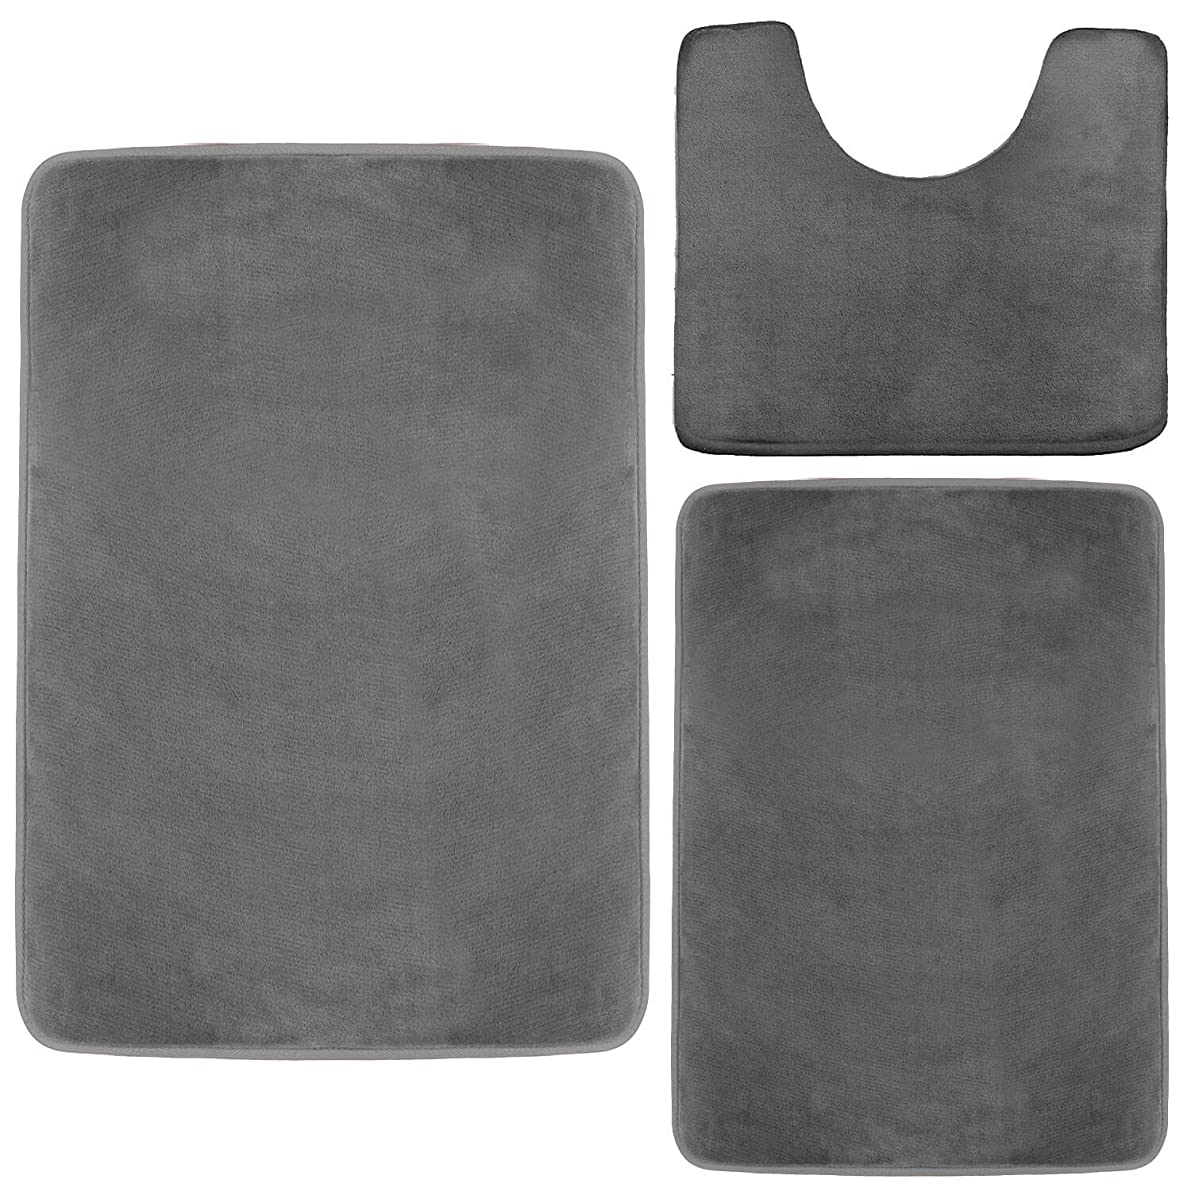 Clara Clark Memory Foam Bath Mat, Ultra Soft Non Slip and Absorbent Bathroom Rug. – Gray, Set of 3 - Small/Large/Contour